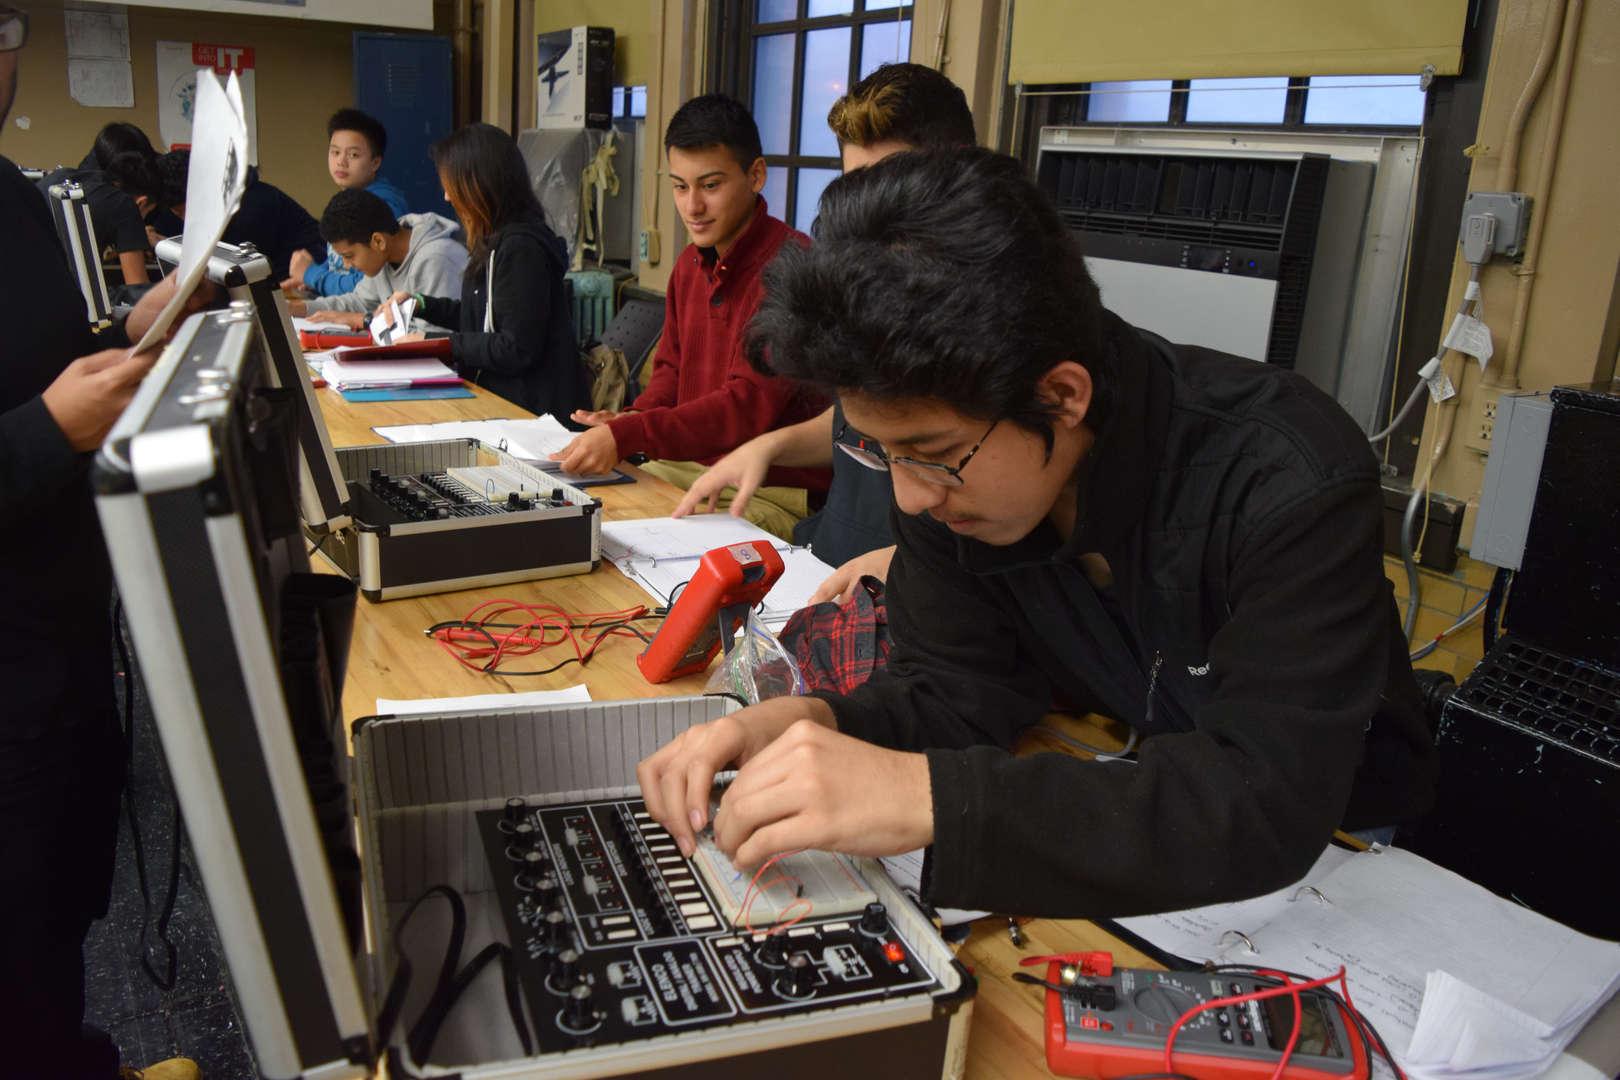 Student repairing a computer